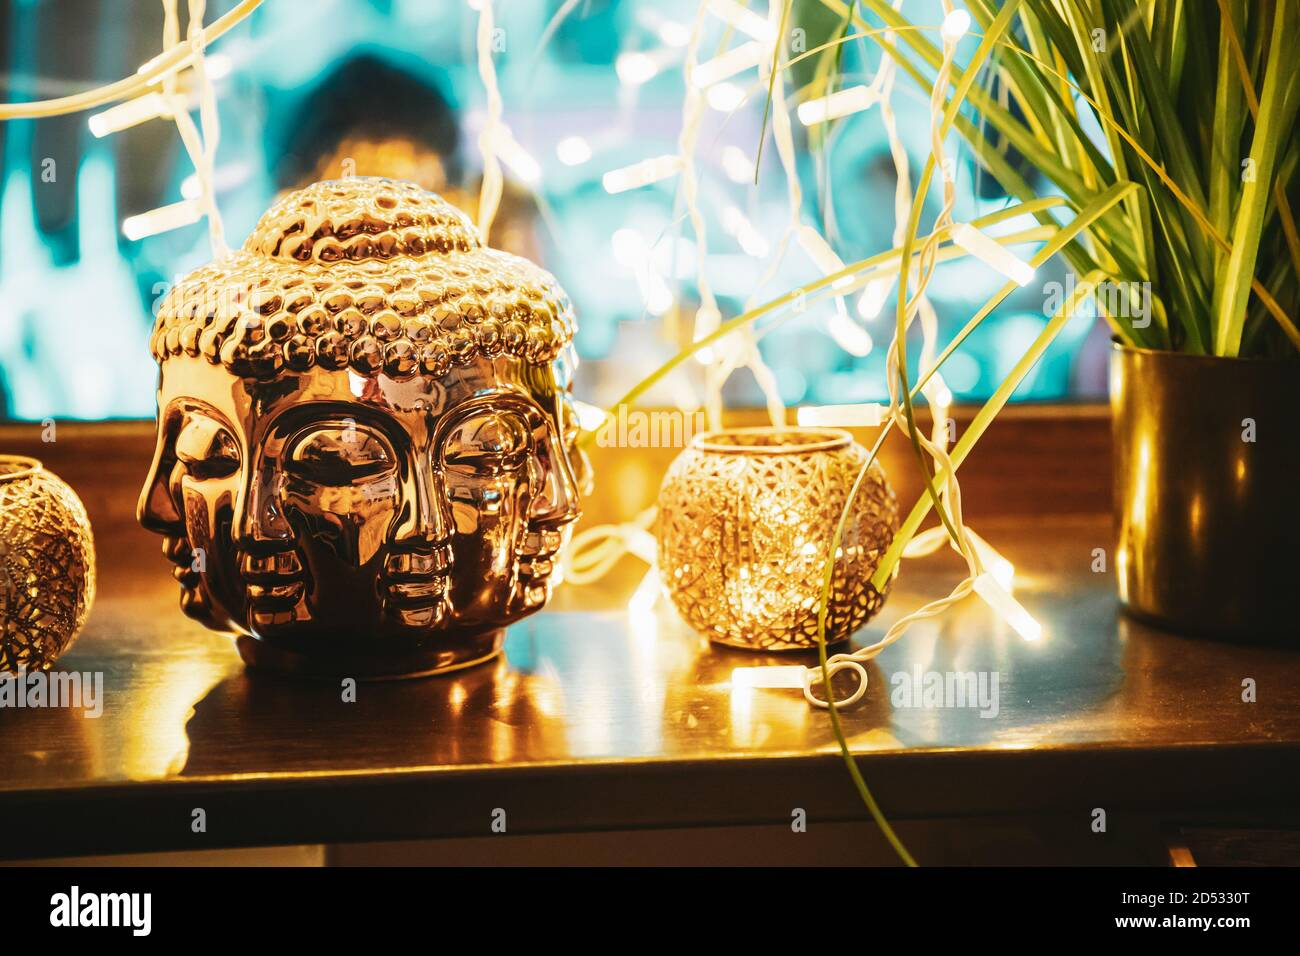 Estatua de oro de Buda cabeza iluminada por Bokeh Boke Lights. Elemento interior Foto de stock